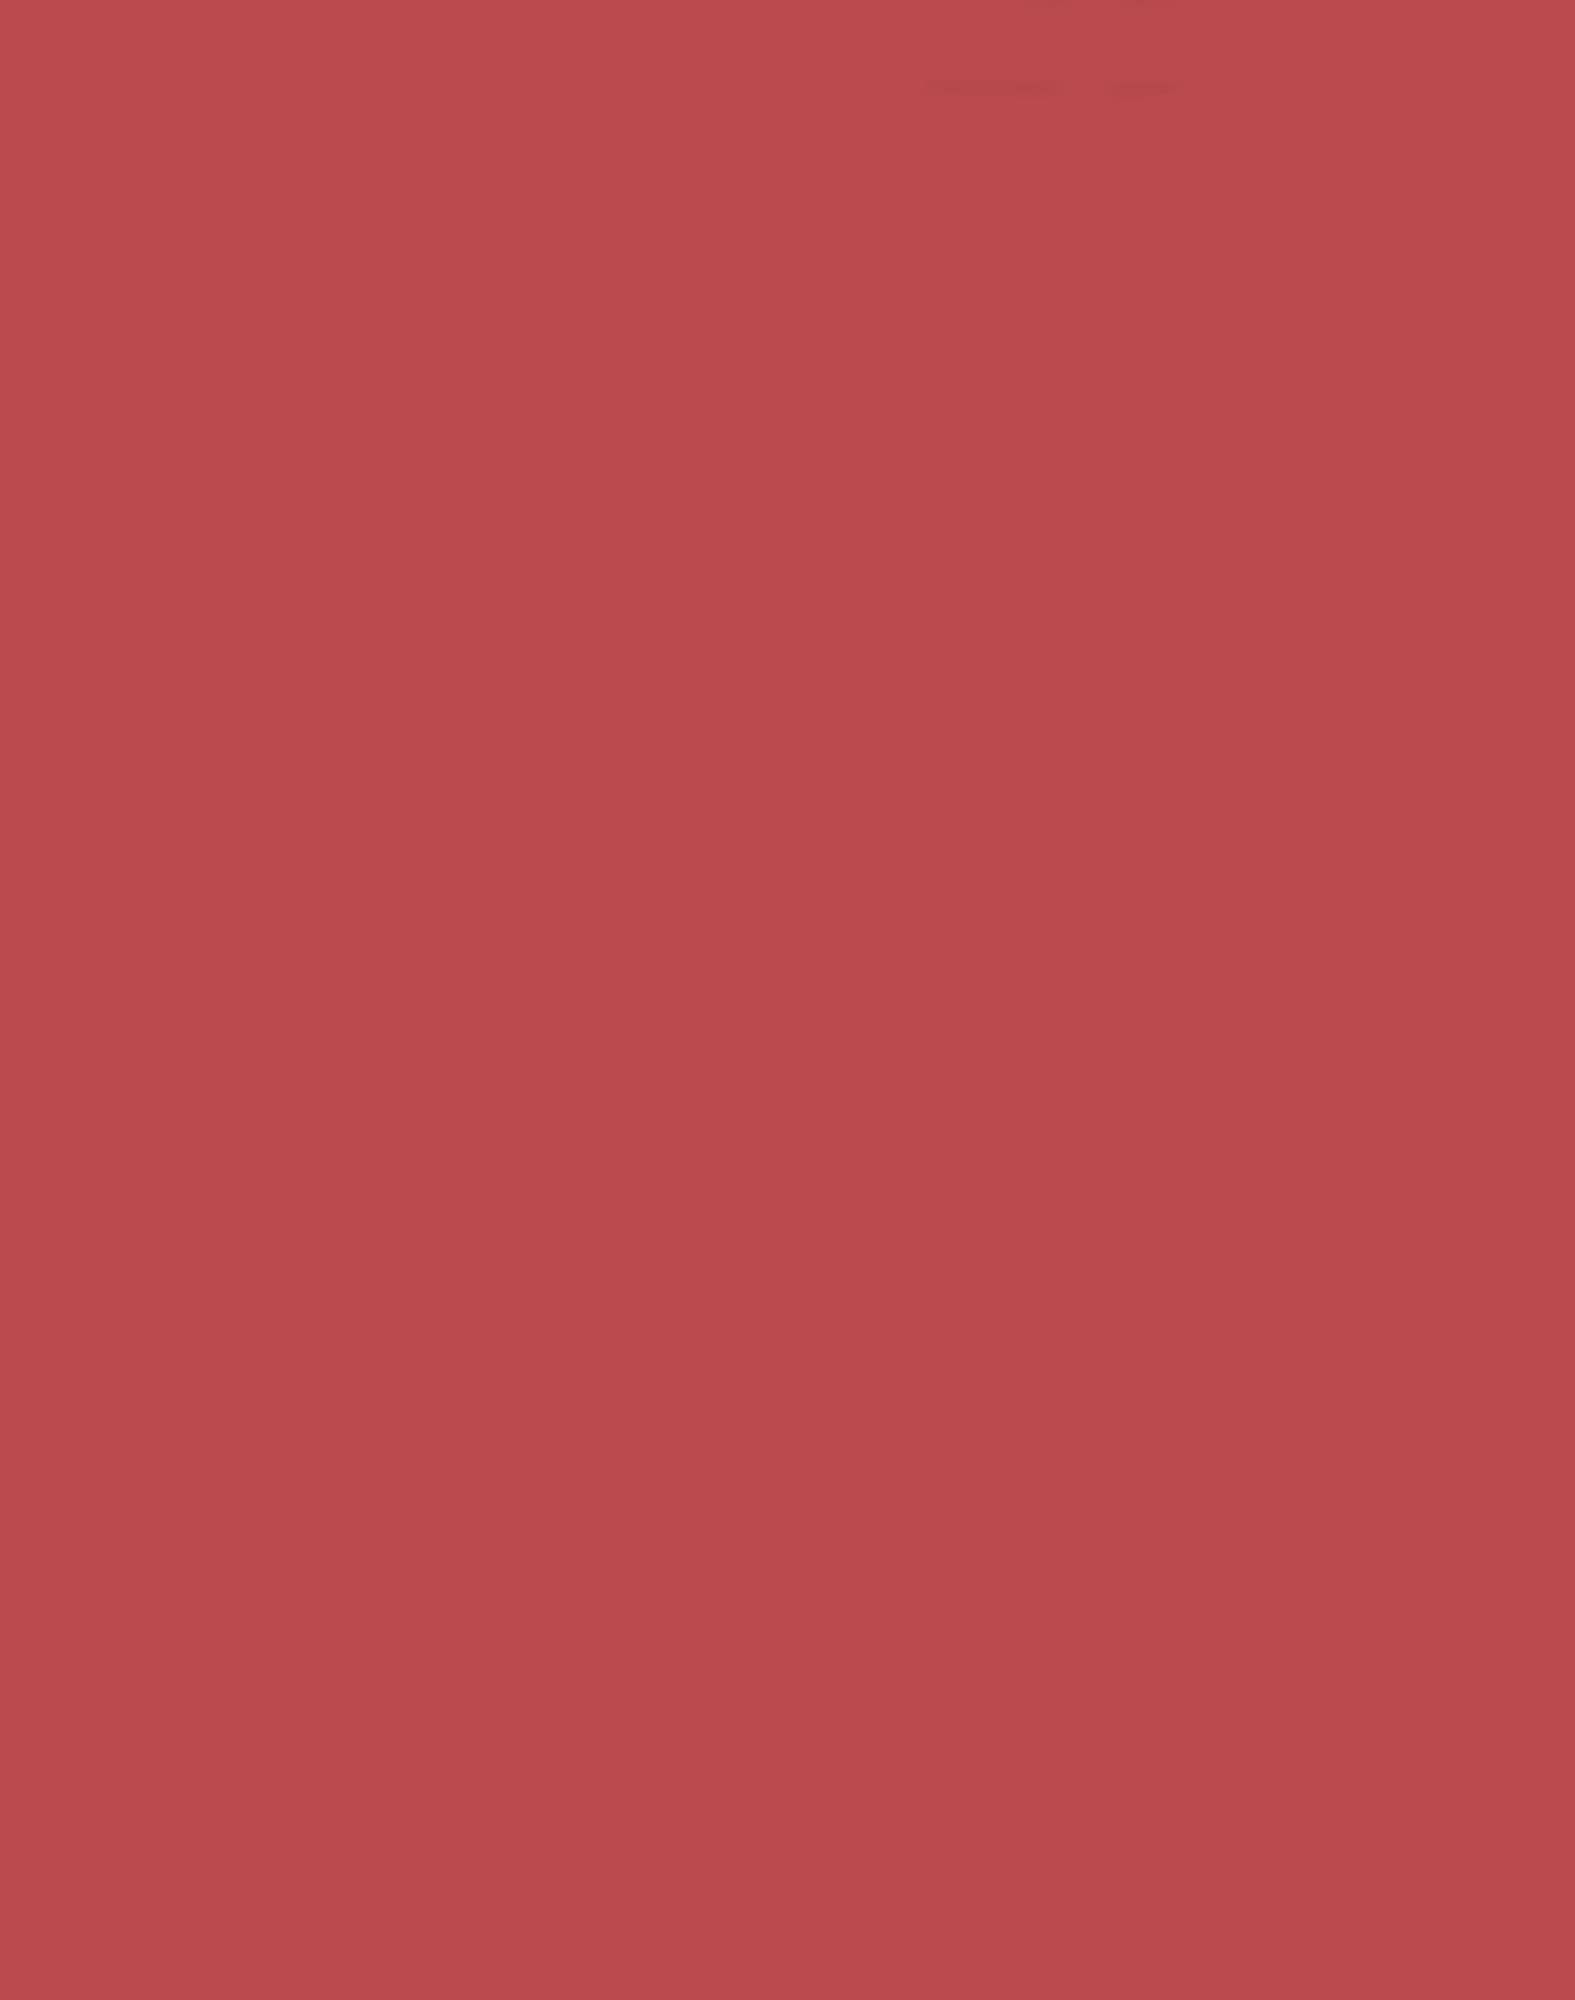 Rich Red 186,74,75